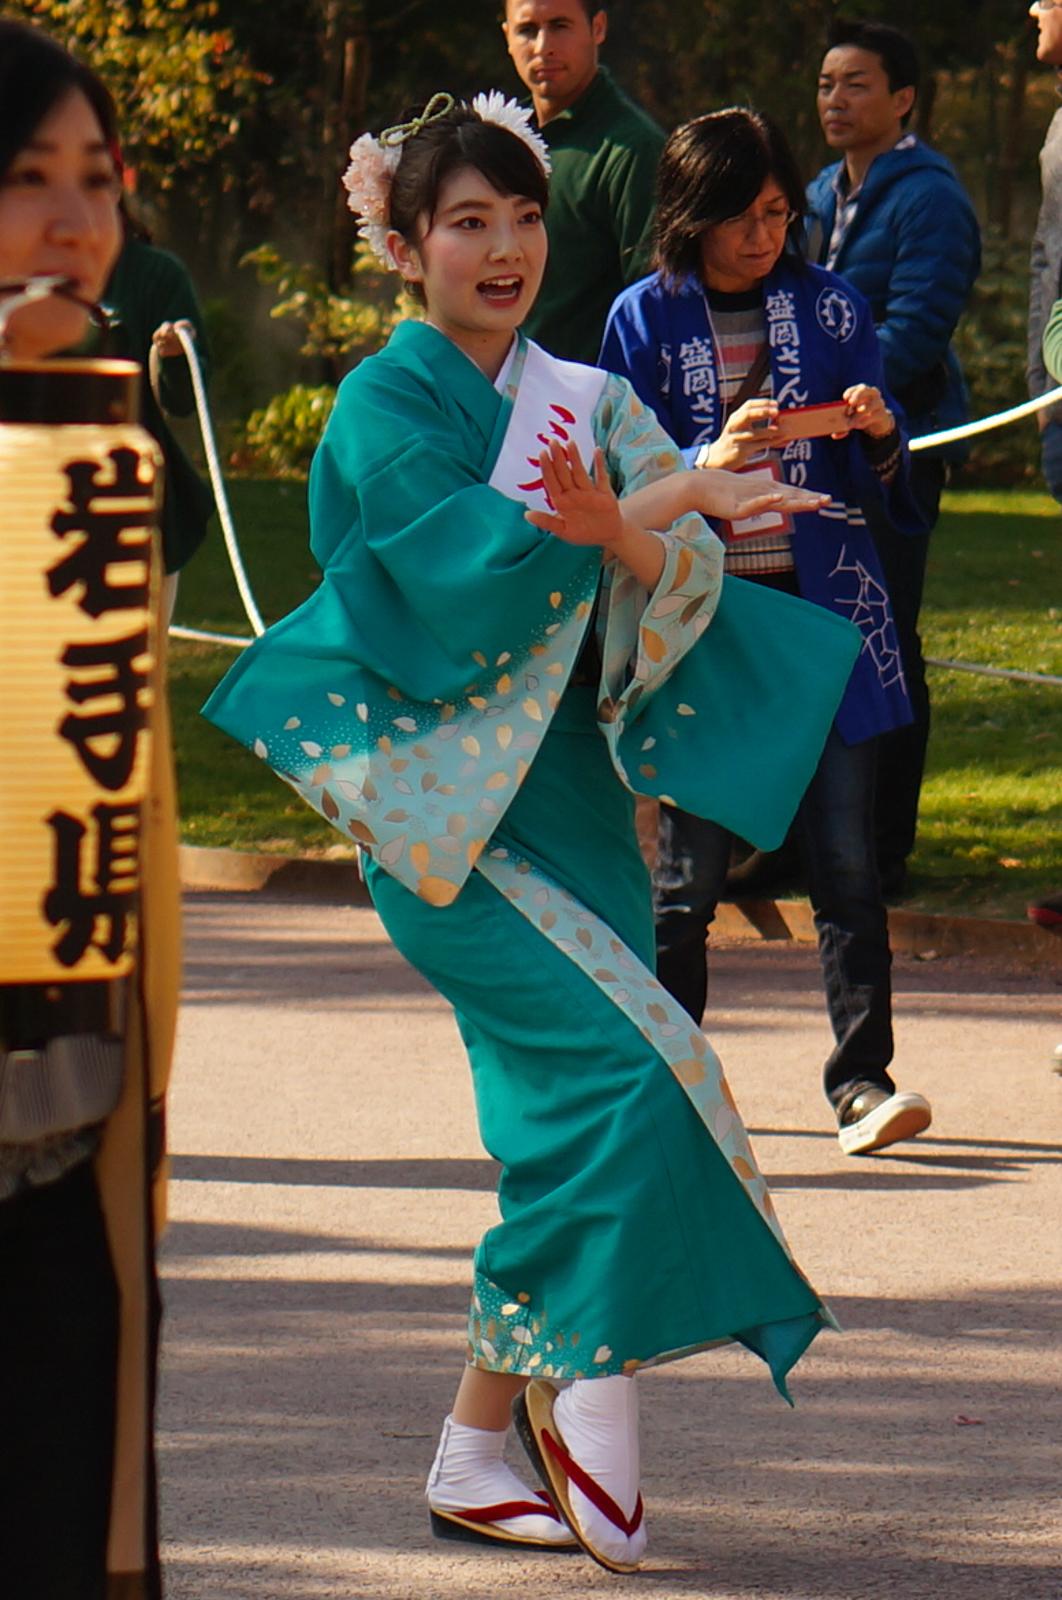 grand matsuri, matsuri jardin d'acclimatation, matsuri japonismes, japonismes 2018, japon paris, évènement japon paris